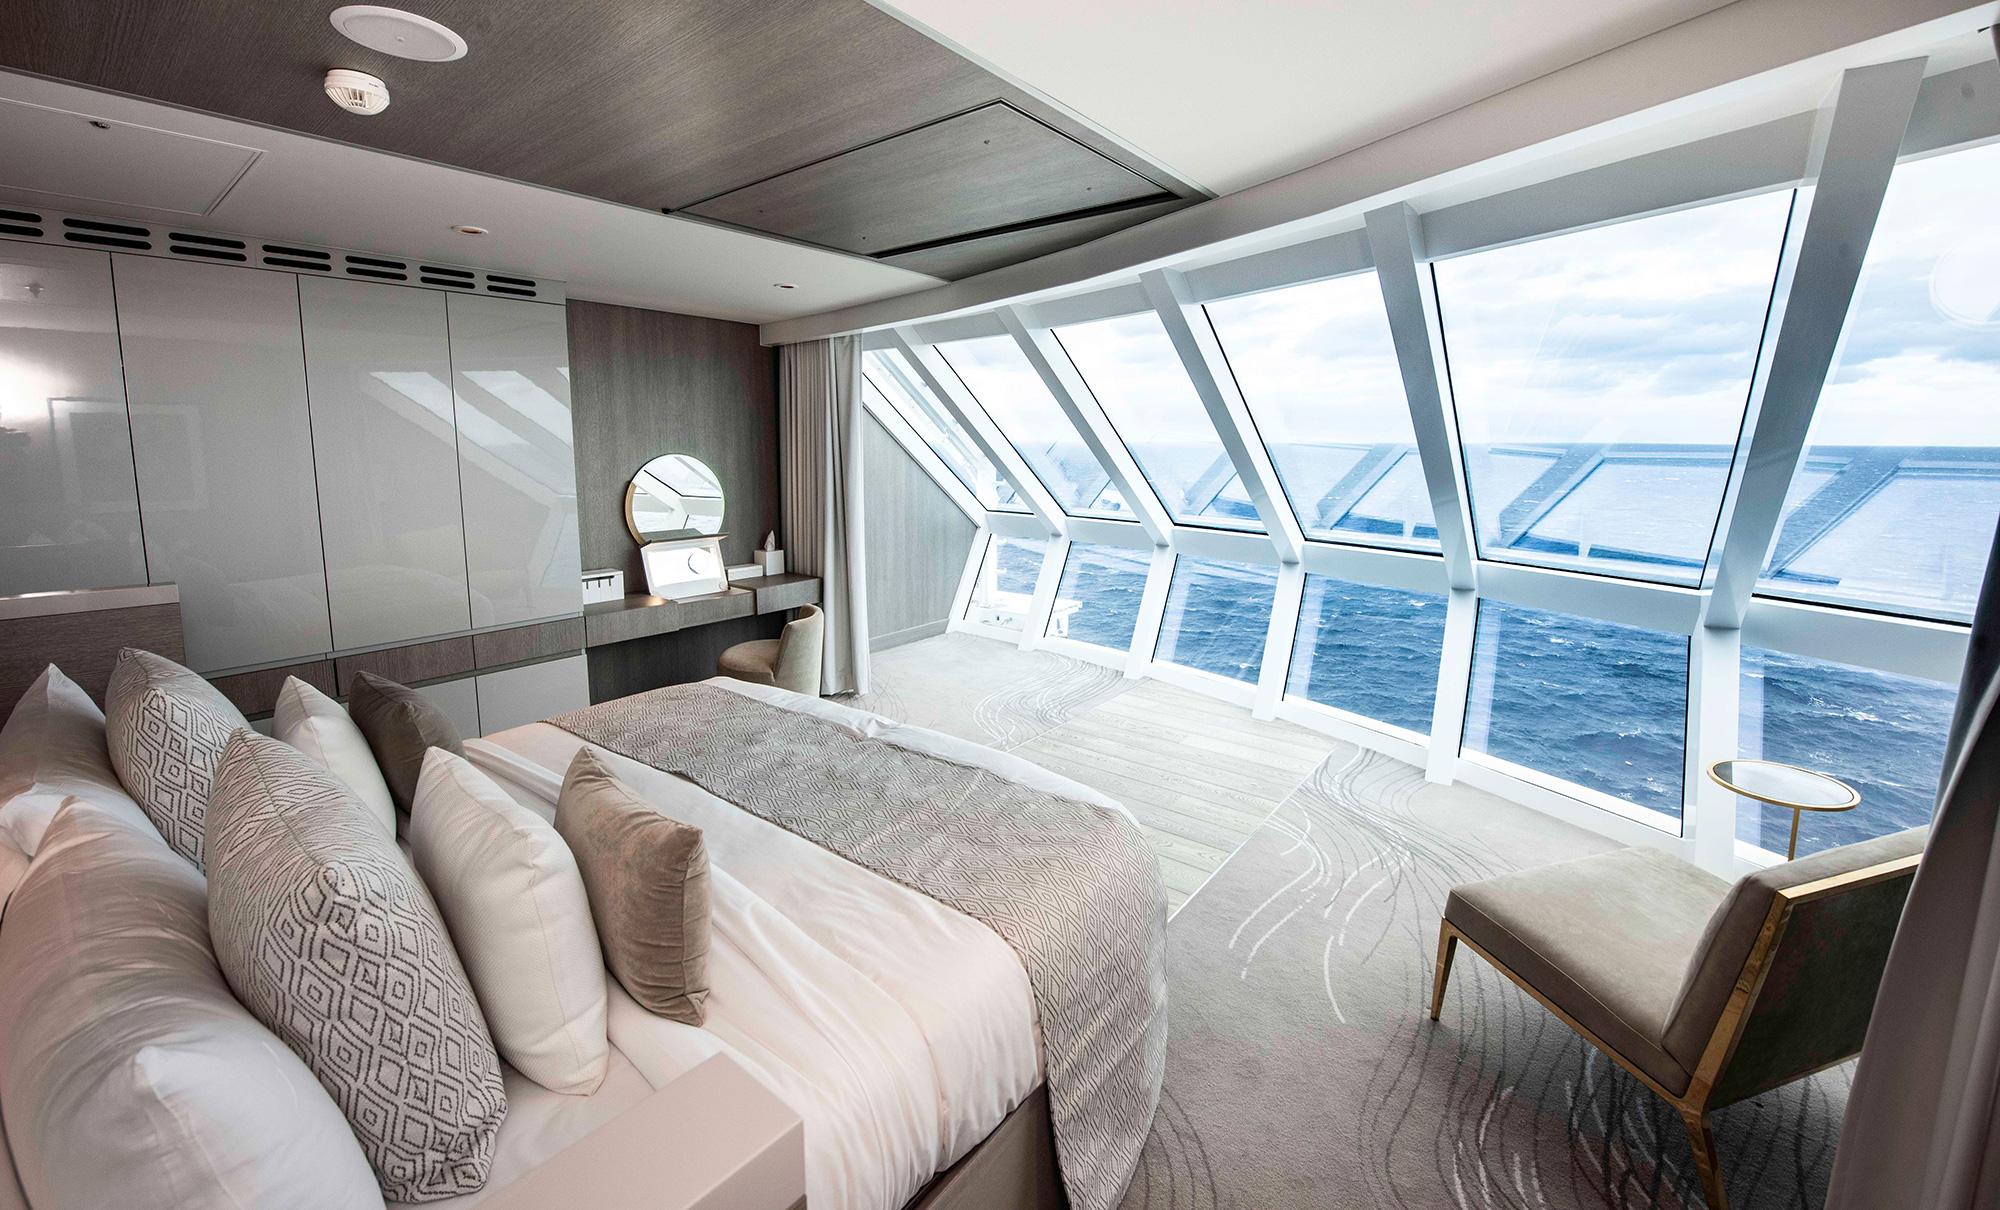 Suite Celebrity Edge von Celebrity Cruises (Foto: Steve Dunlop)